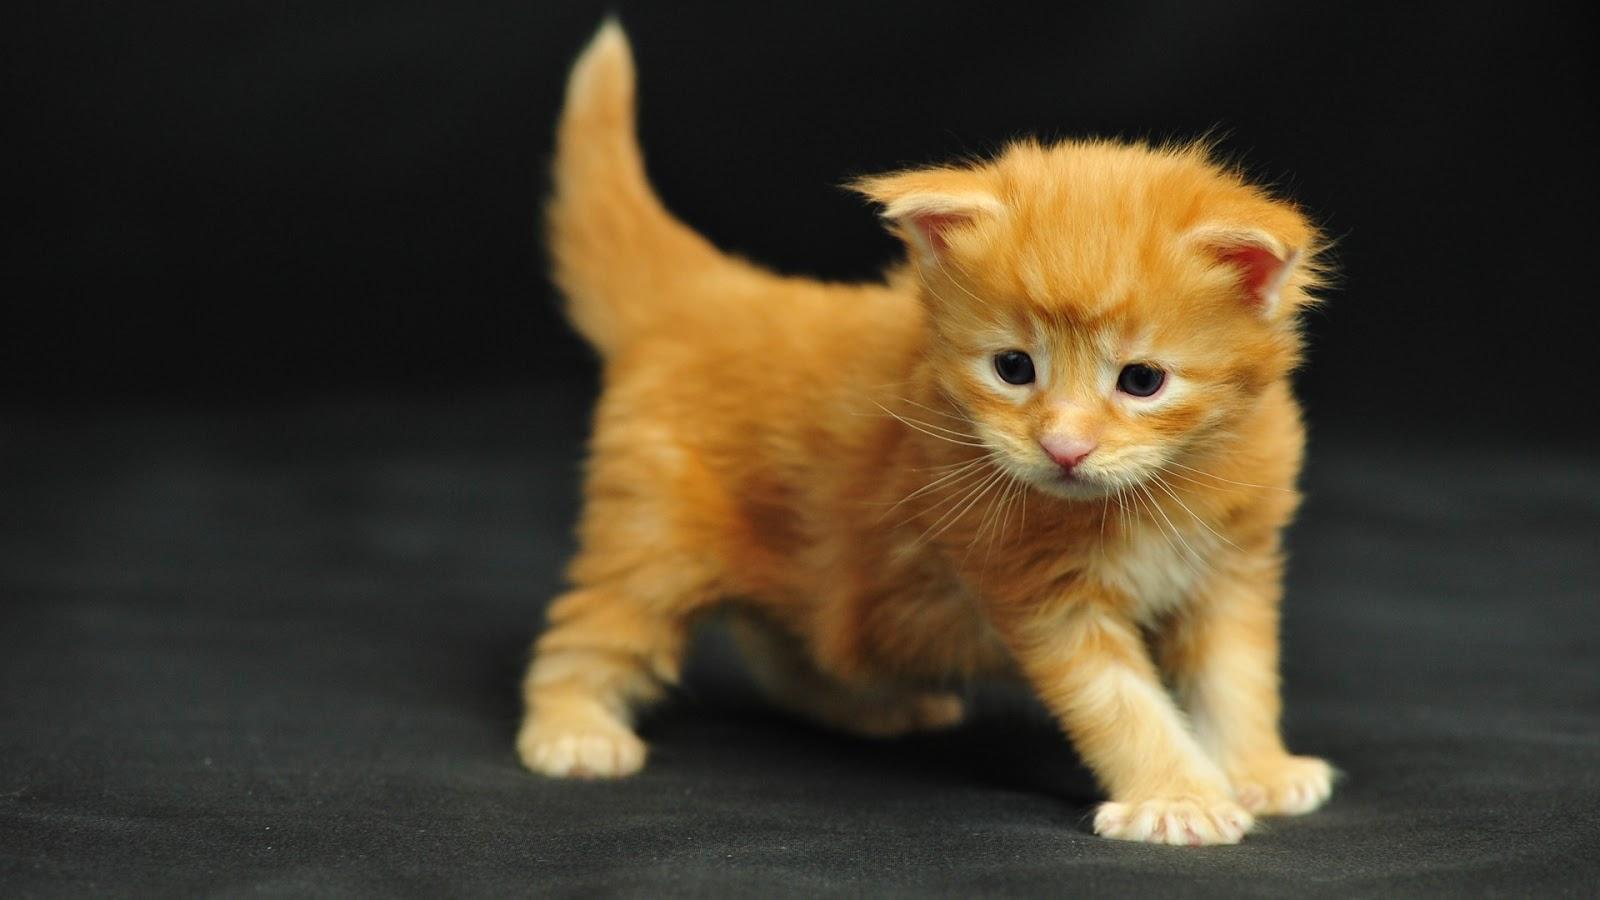 http://1.bp.blogspot.com/-tvqlxUdDN3k/UTjXdyu1RuI/AAAAAAAAACk/uQYdmyknbU8/s1600/image-wallpaper-1920-1080-Funny-Cat-Ocean-Maine-Coon-kitten-LOL-cats-Ni794894.jpg